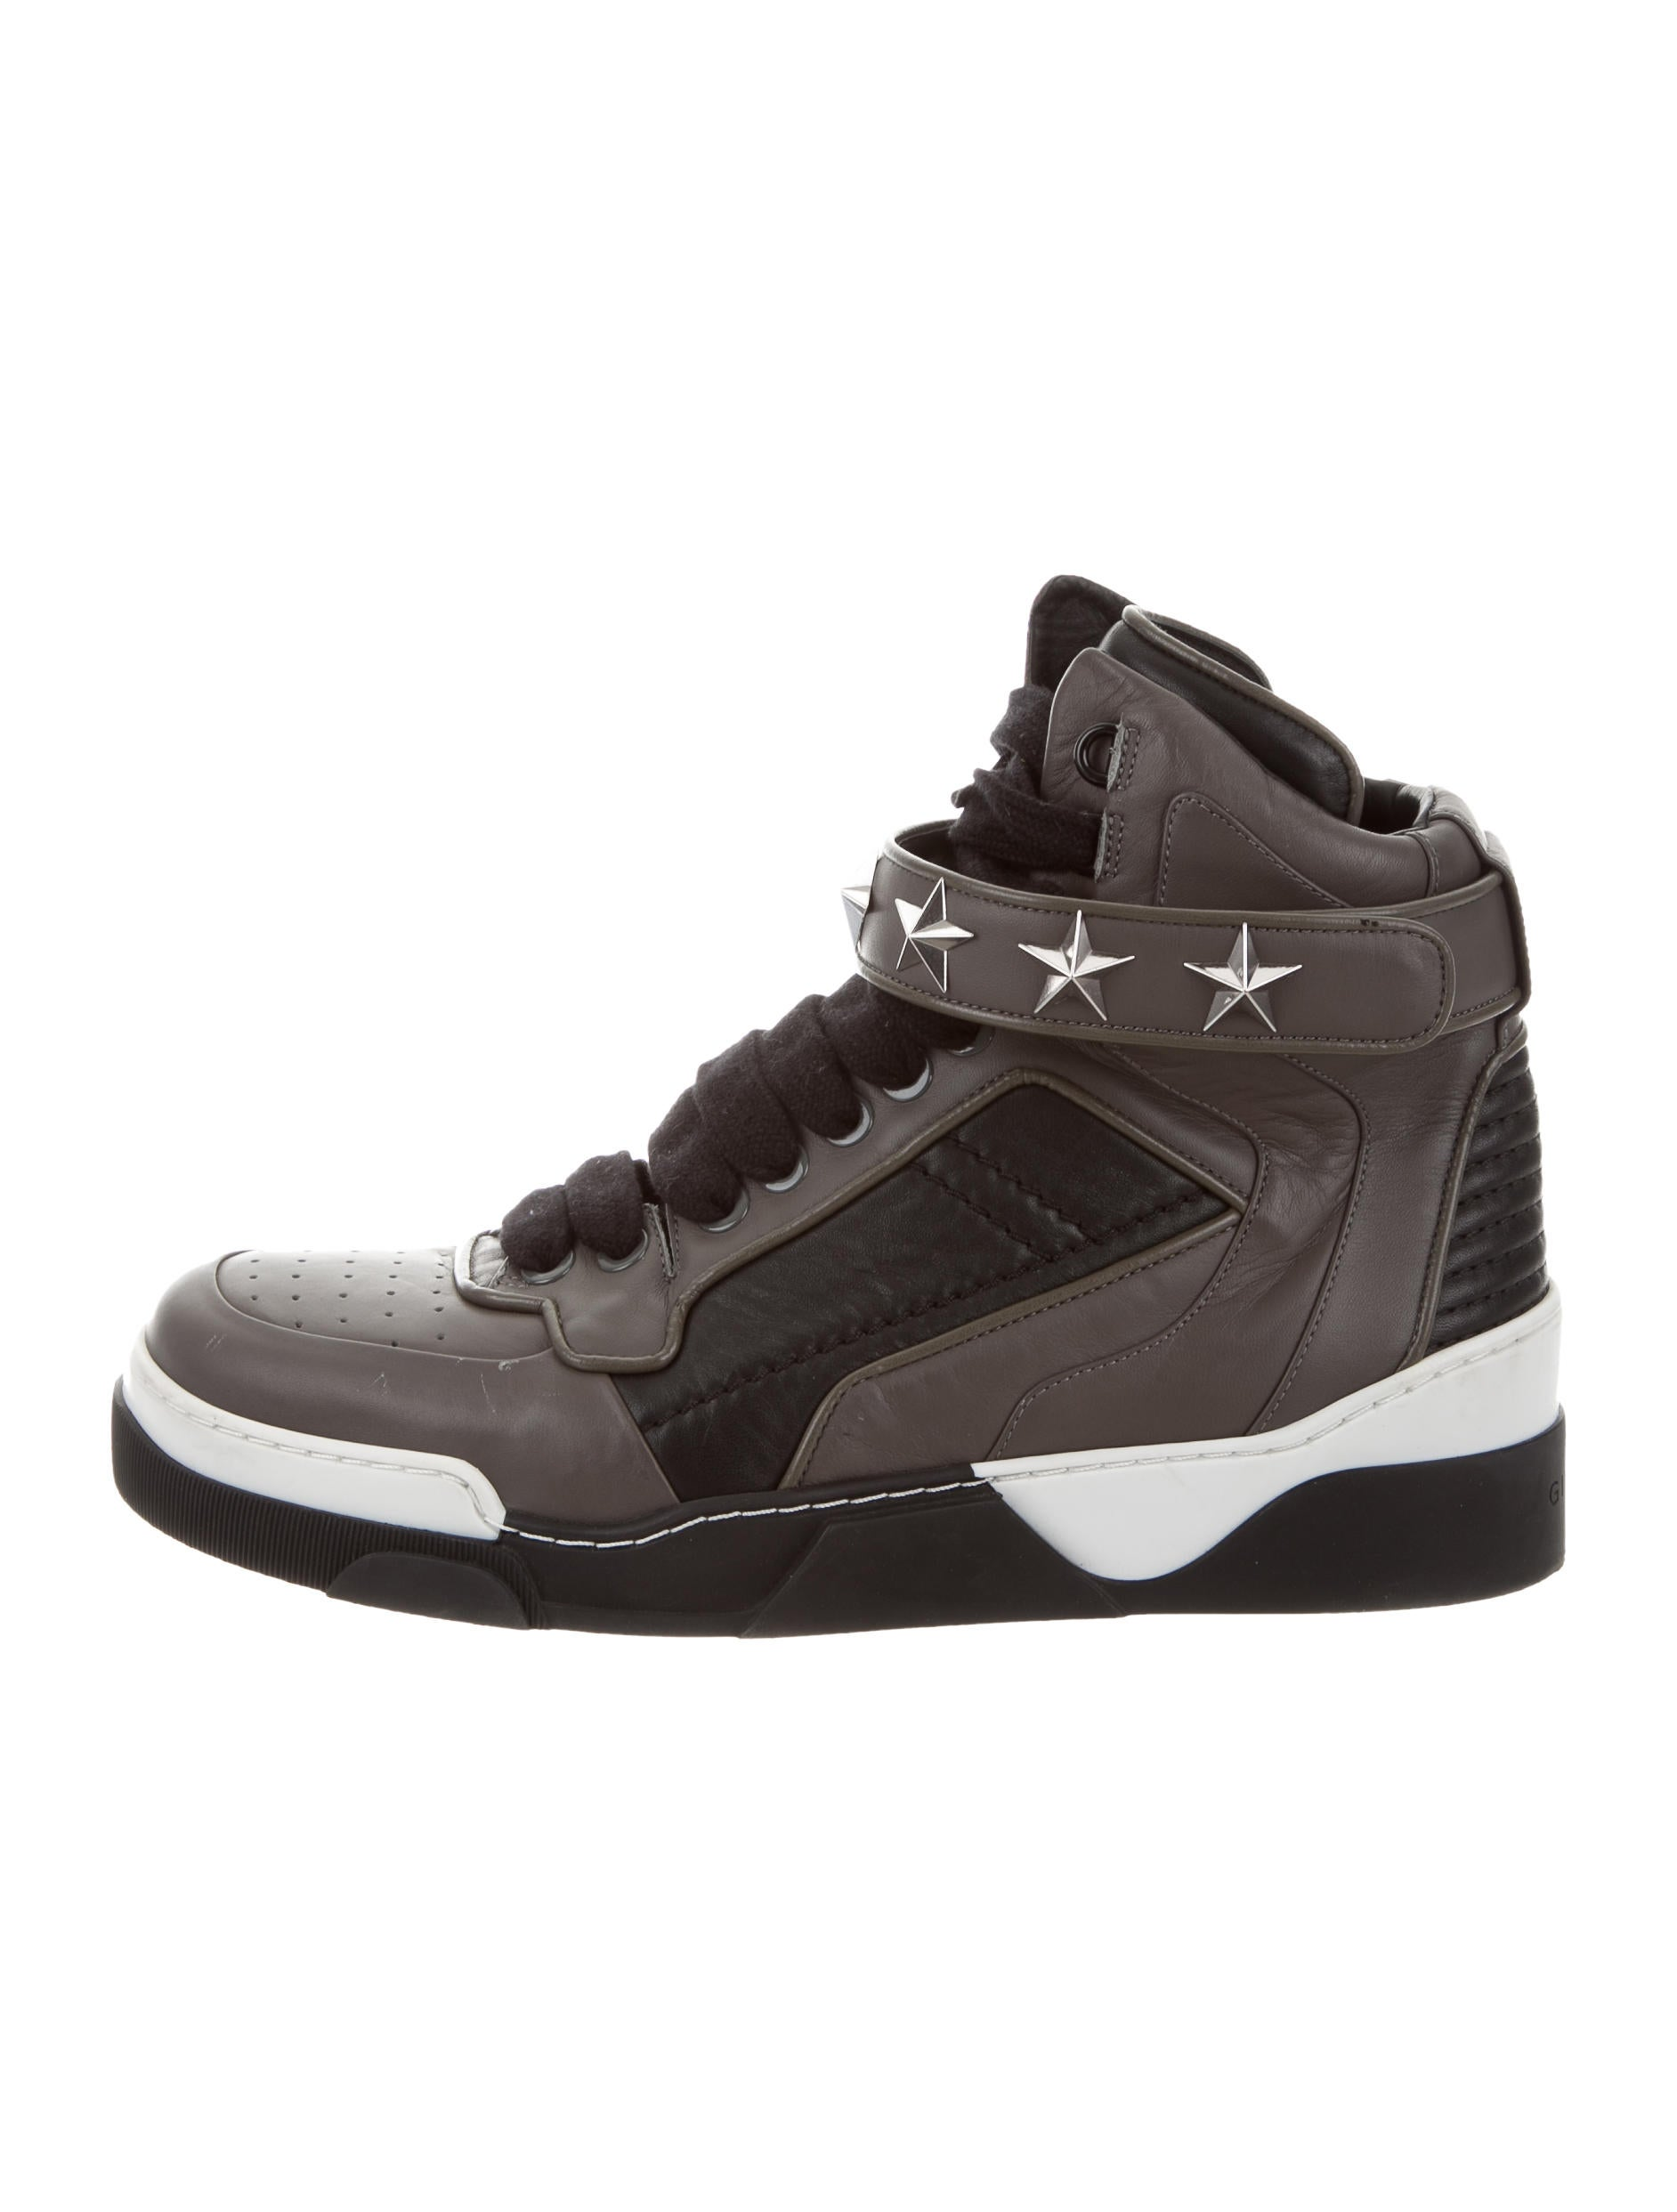 85deac5243e Skor Sneakers High Top Giv44614 Tyson The Realreal Givenchy p6B4wP6